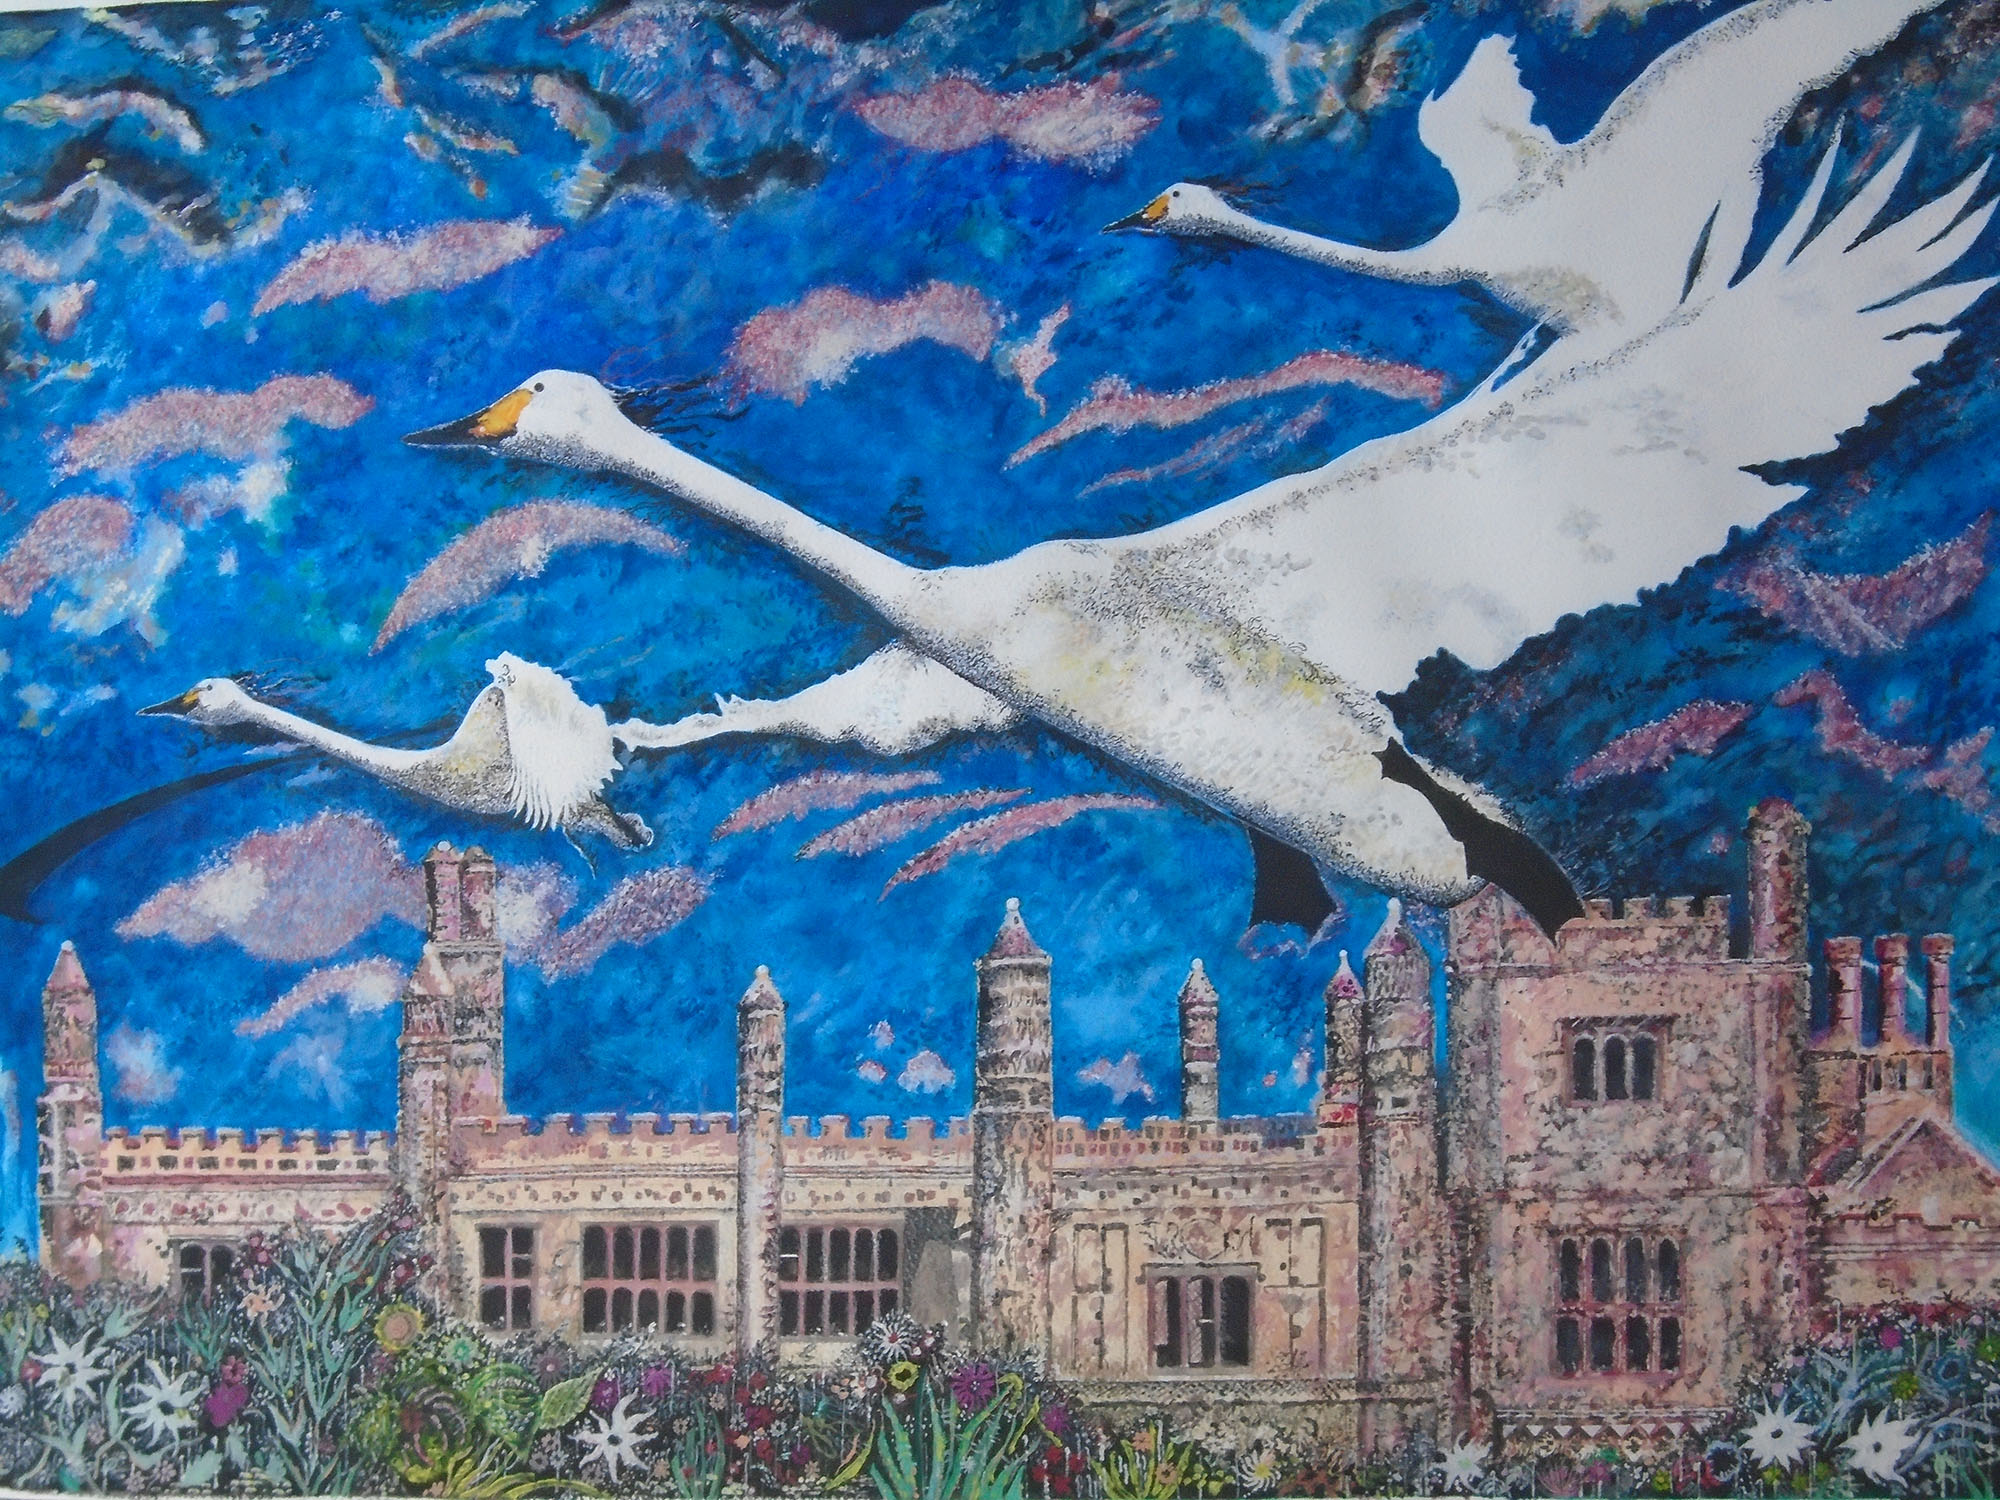 Barrie Morris original painting of East Barsham Manor